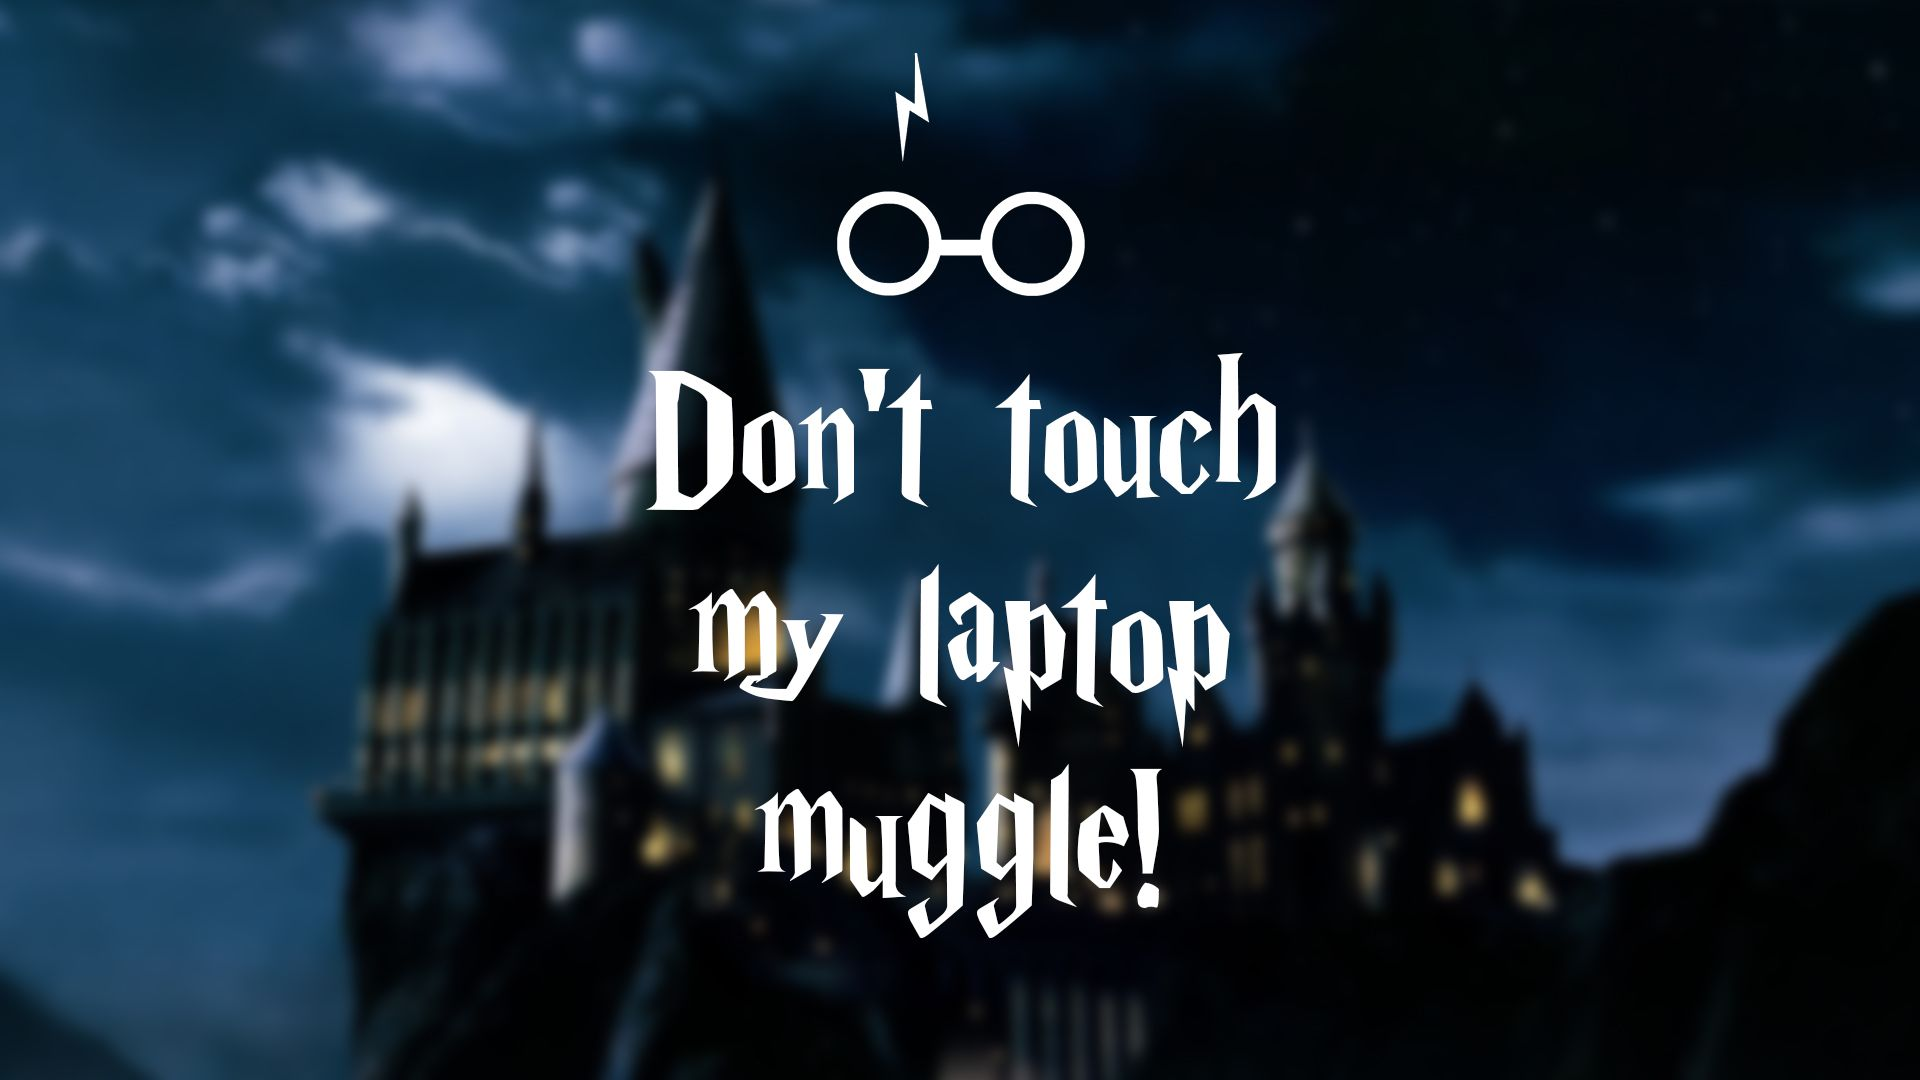 Harry Potter Laptop Wallpaper Muggle By Nikital D97d6v7 Jpg 1920 1080 Fondos De Pantalla Para Portatil Fondos De Escritorio Fondos Para Computadora